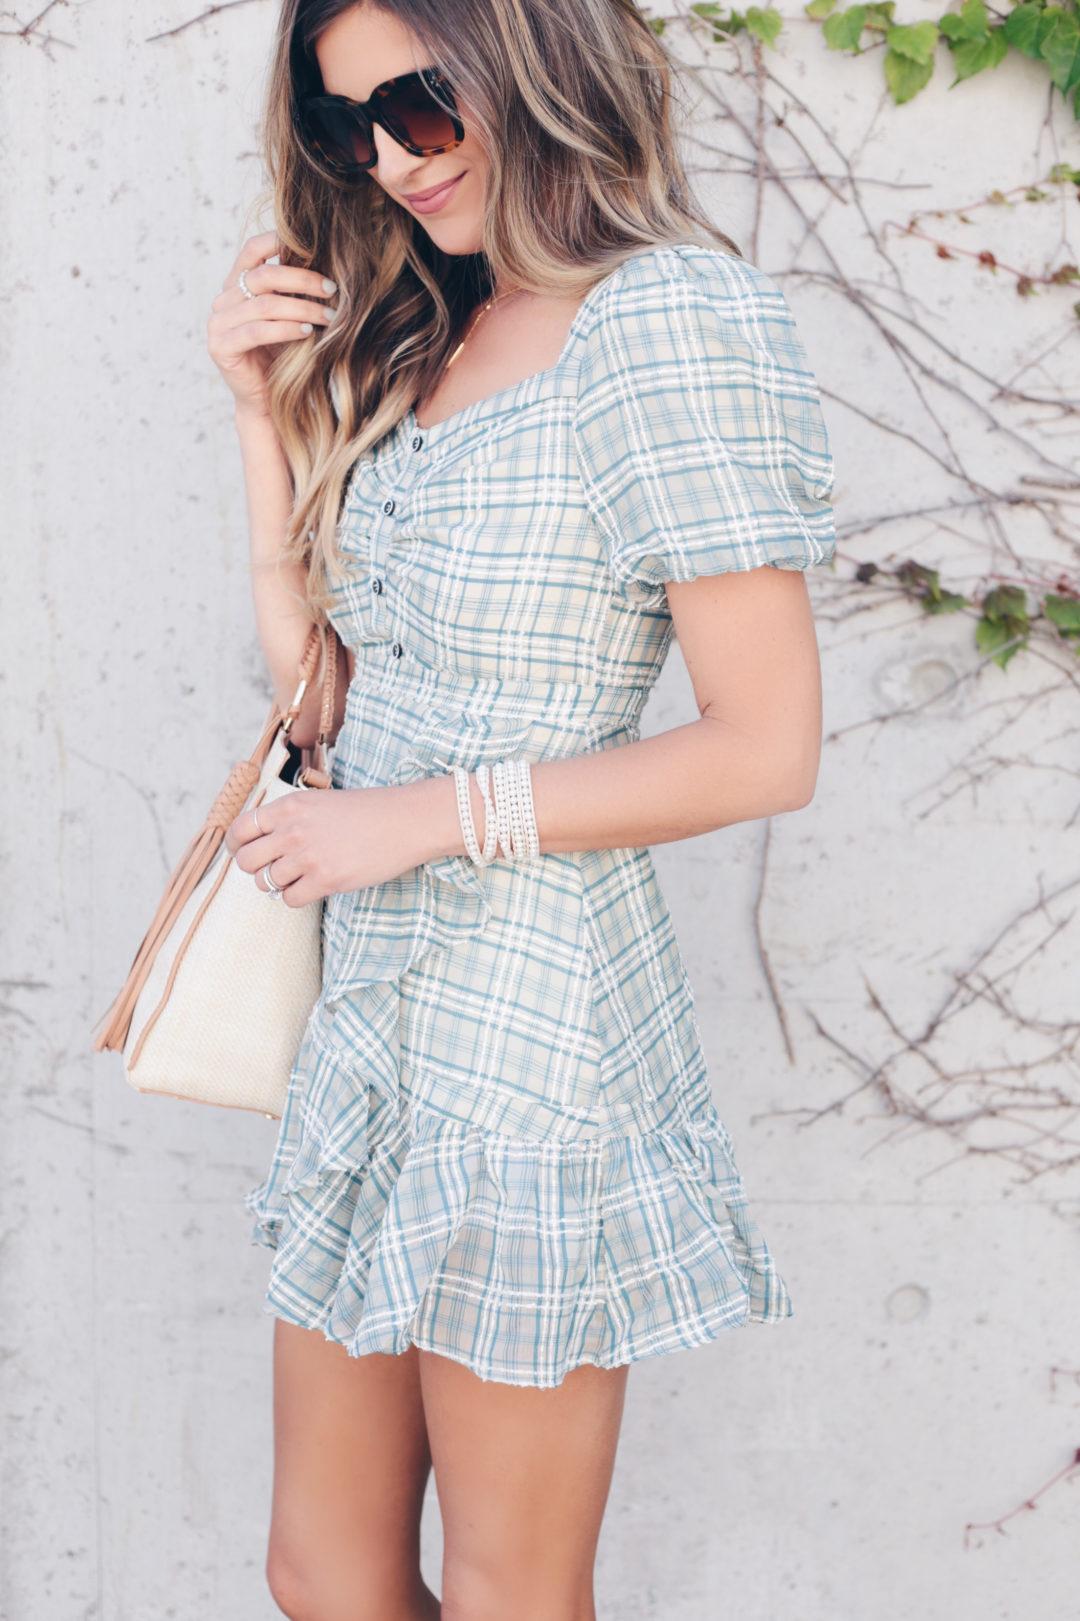 statement print summer dress - pinteresting plans fashion blog